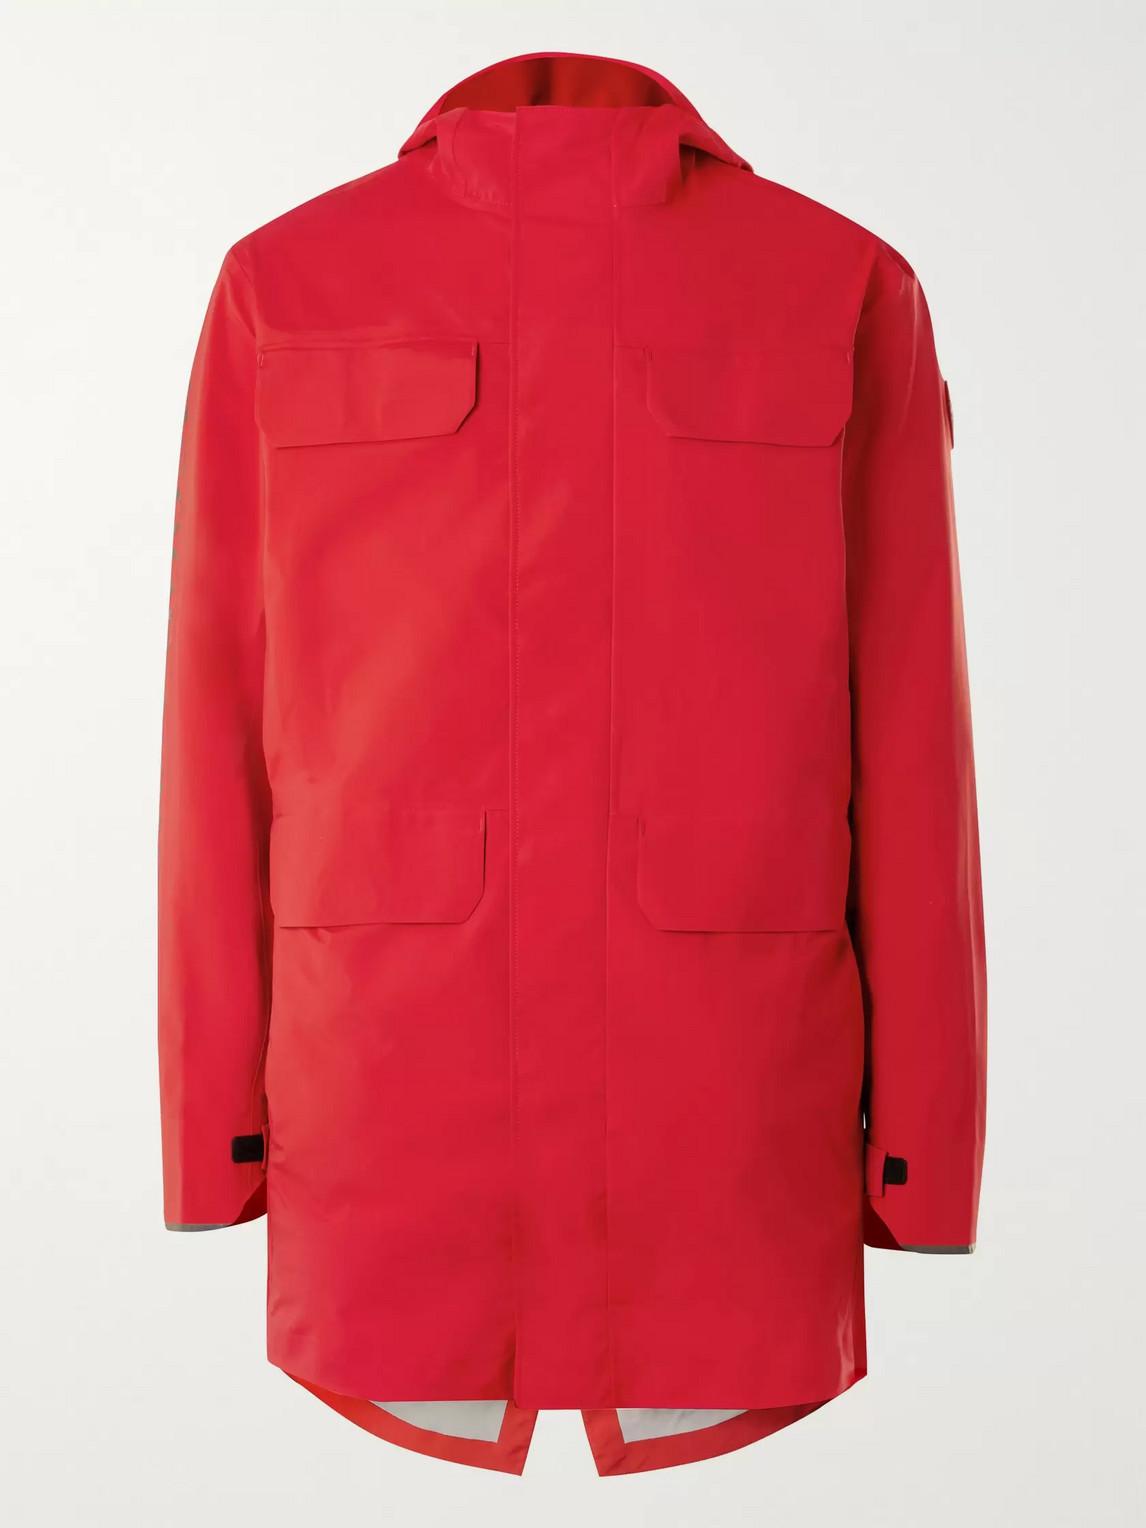 canada goose - seawolf logo-print tri-durance hooded jacket - men - red